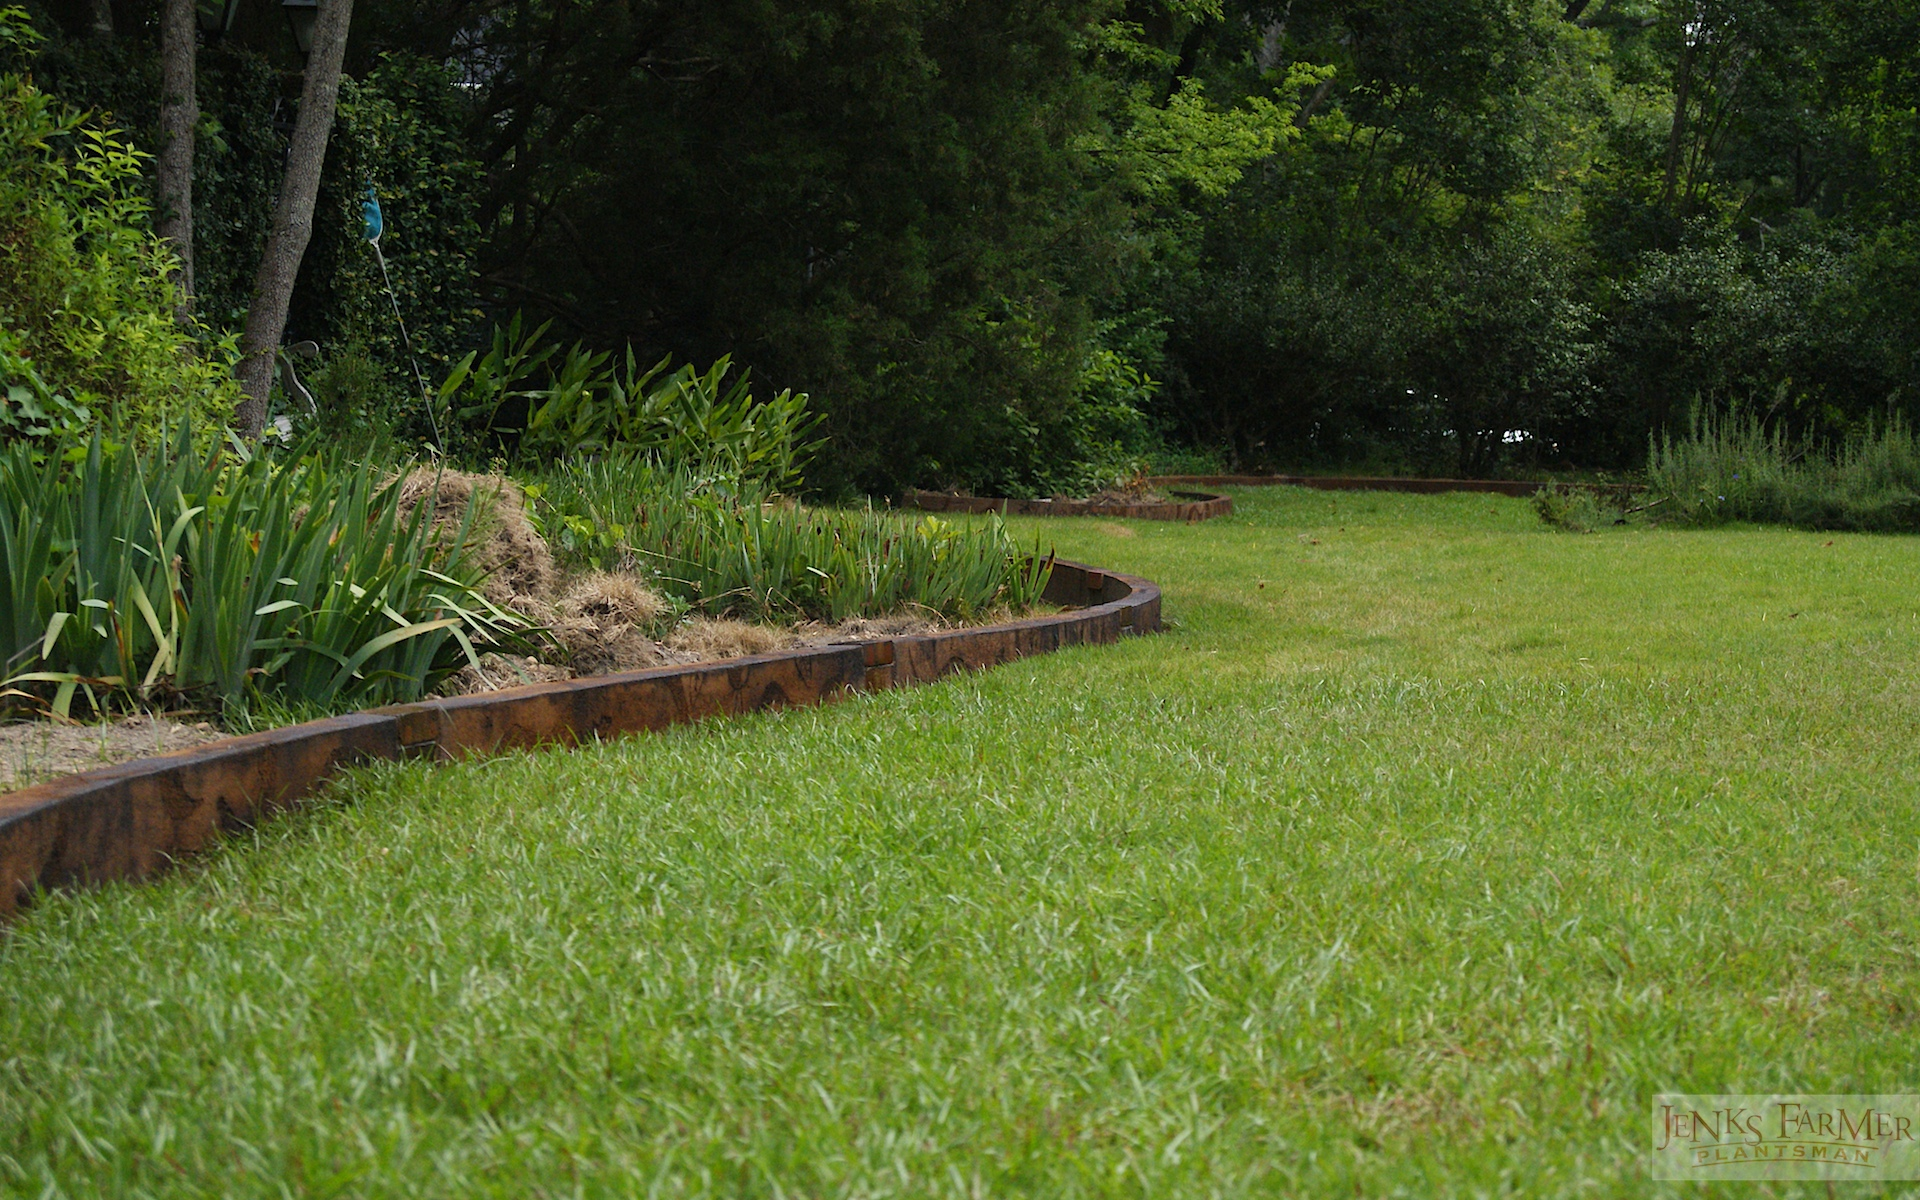 Suburban Backyard Garden : Suburban Gardens We?ve Designed (click to enlarge pics)  Jenks